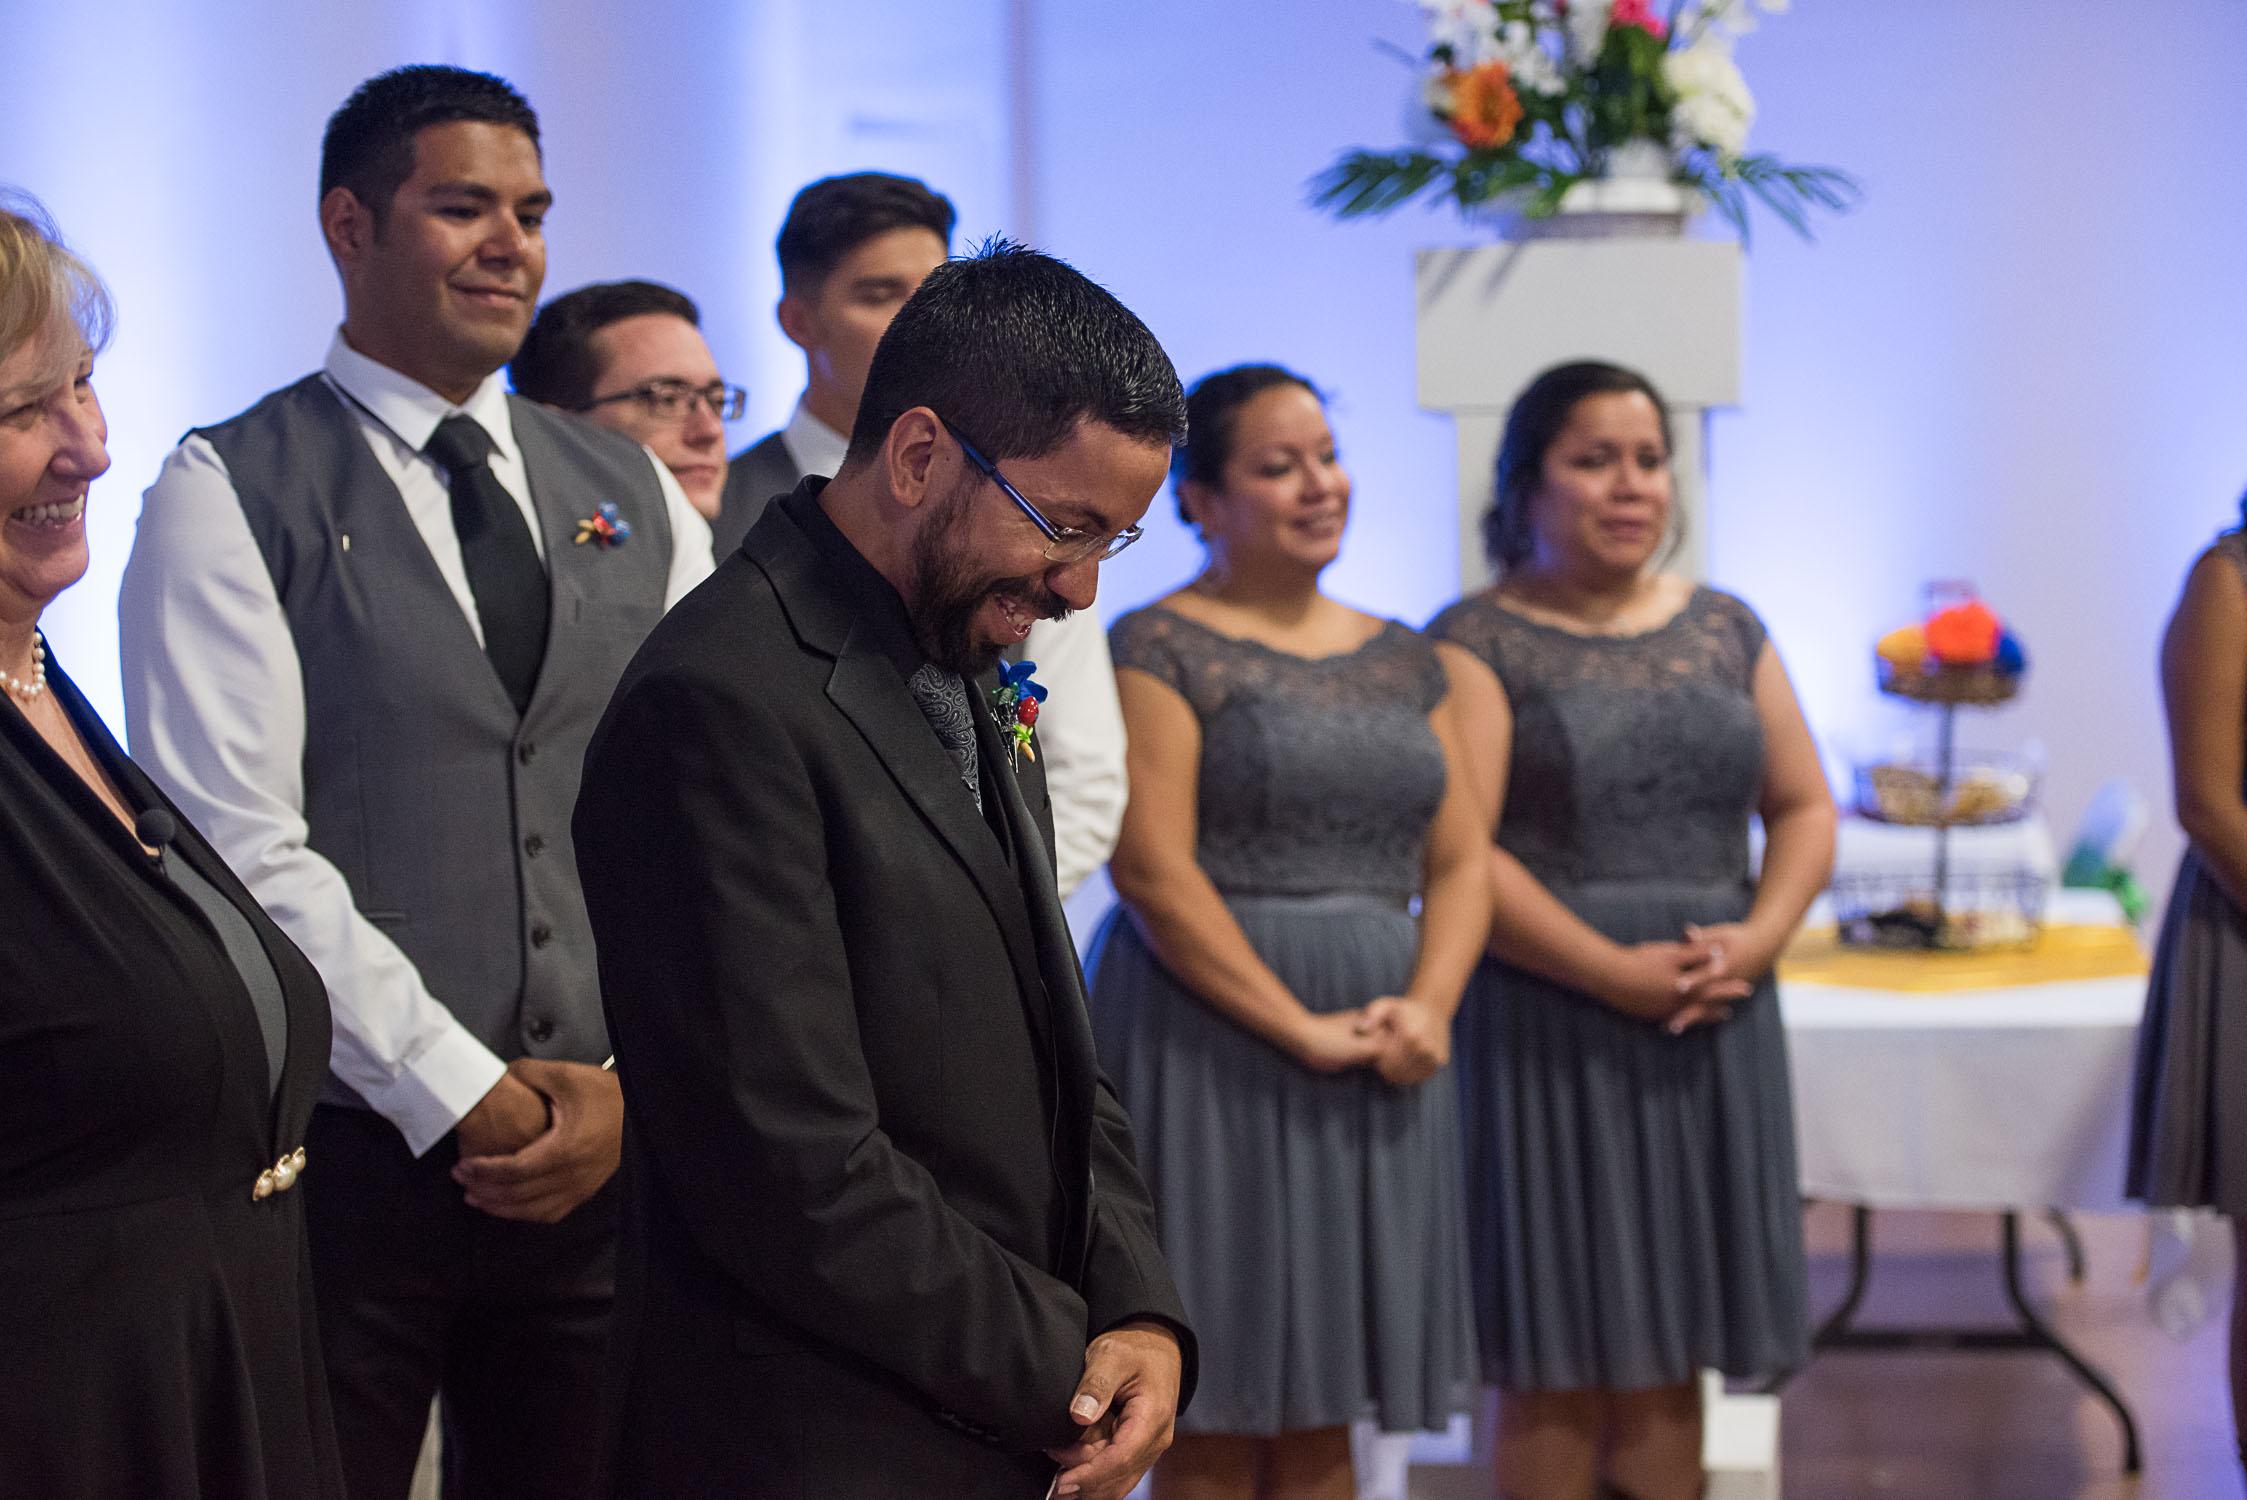 Leal Wedding Mira Visu Photography-107.jpg